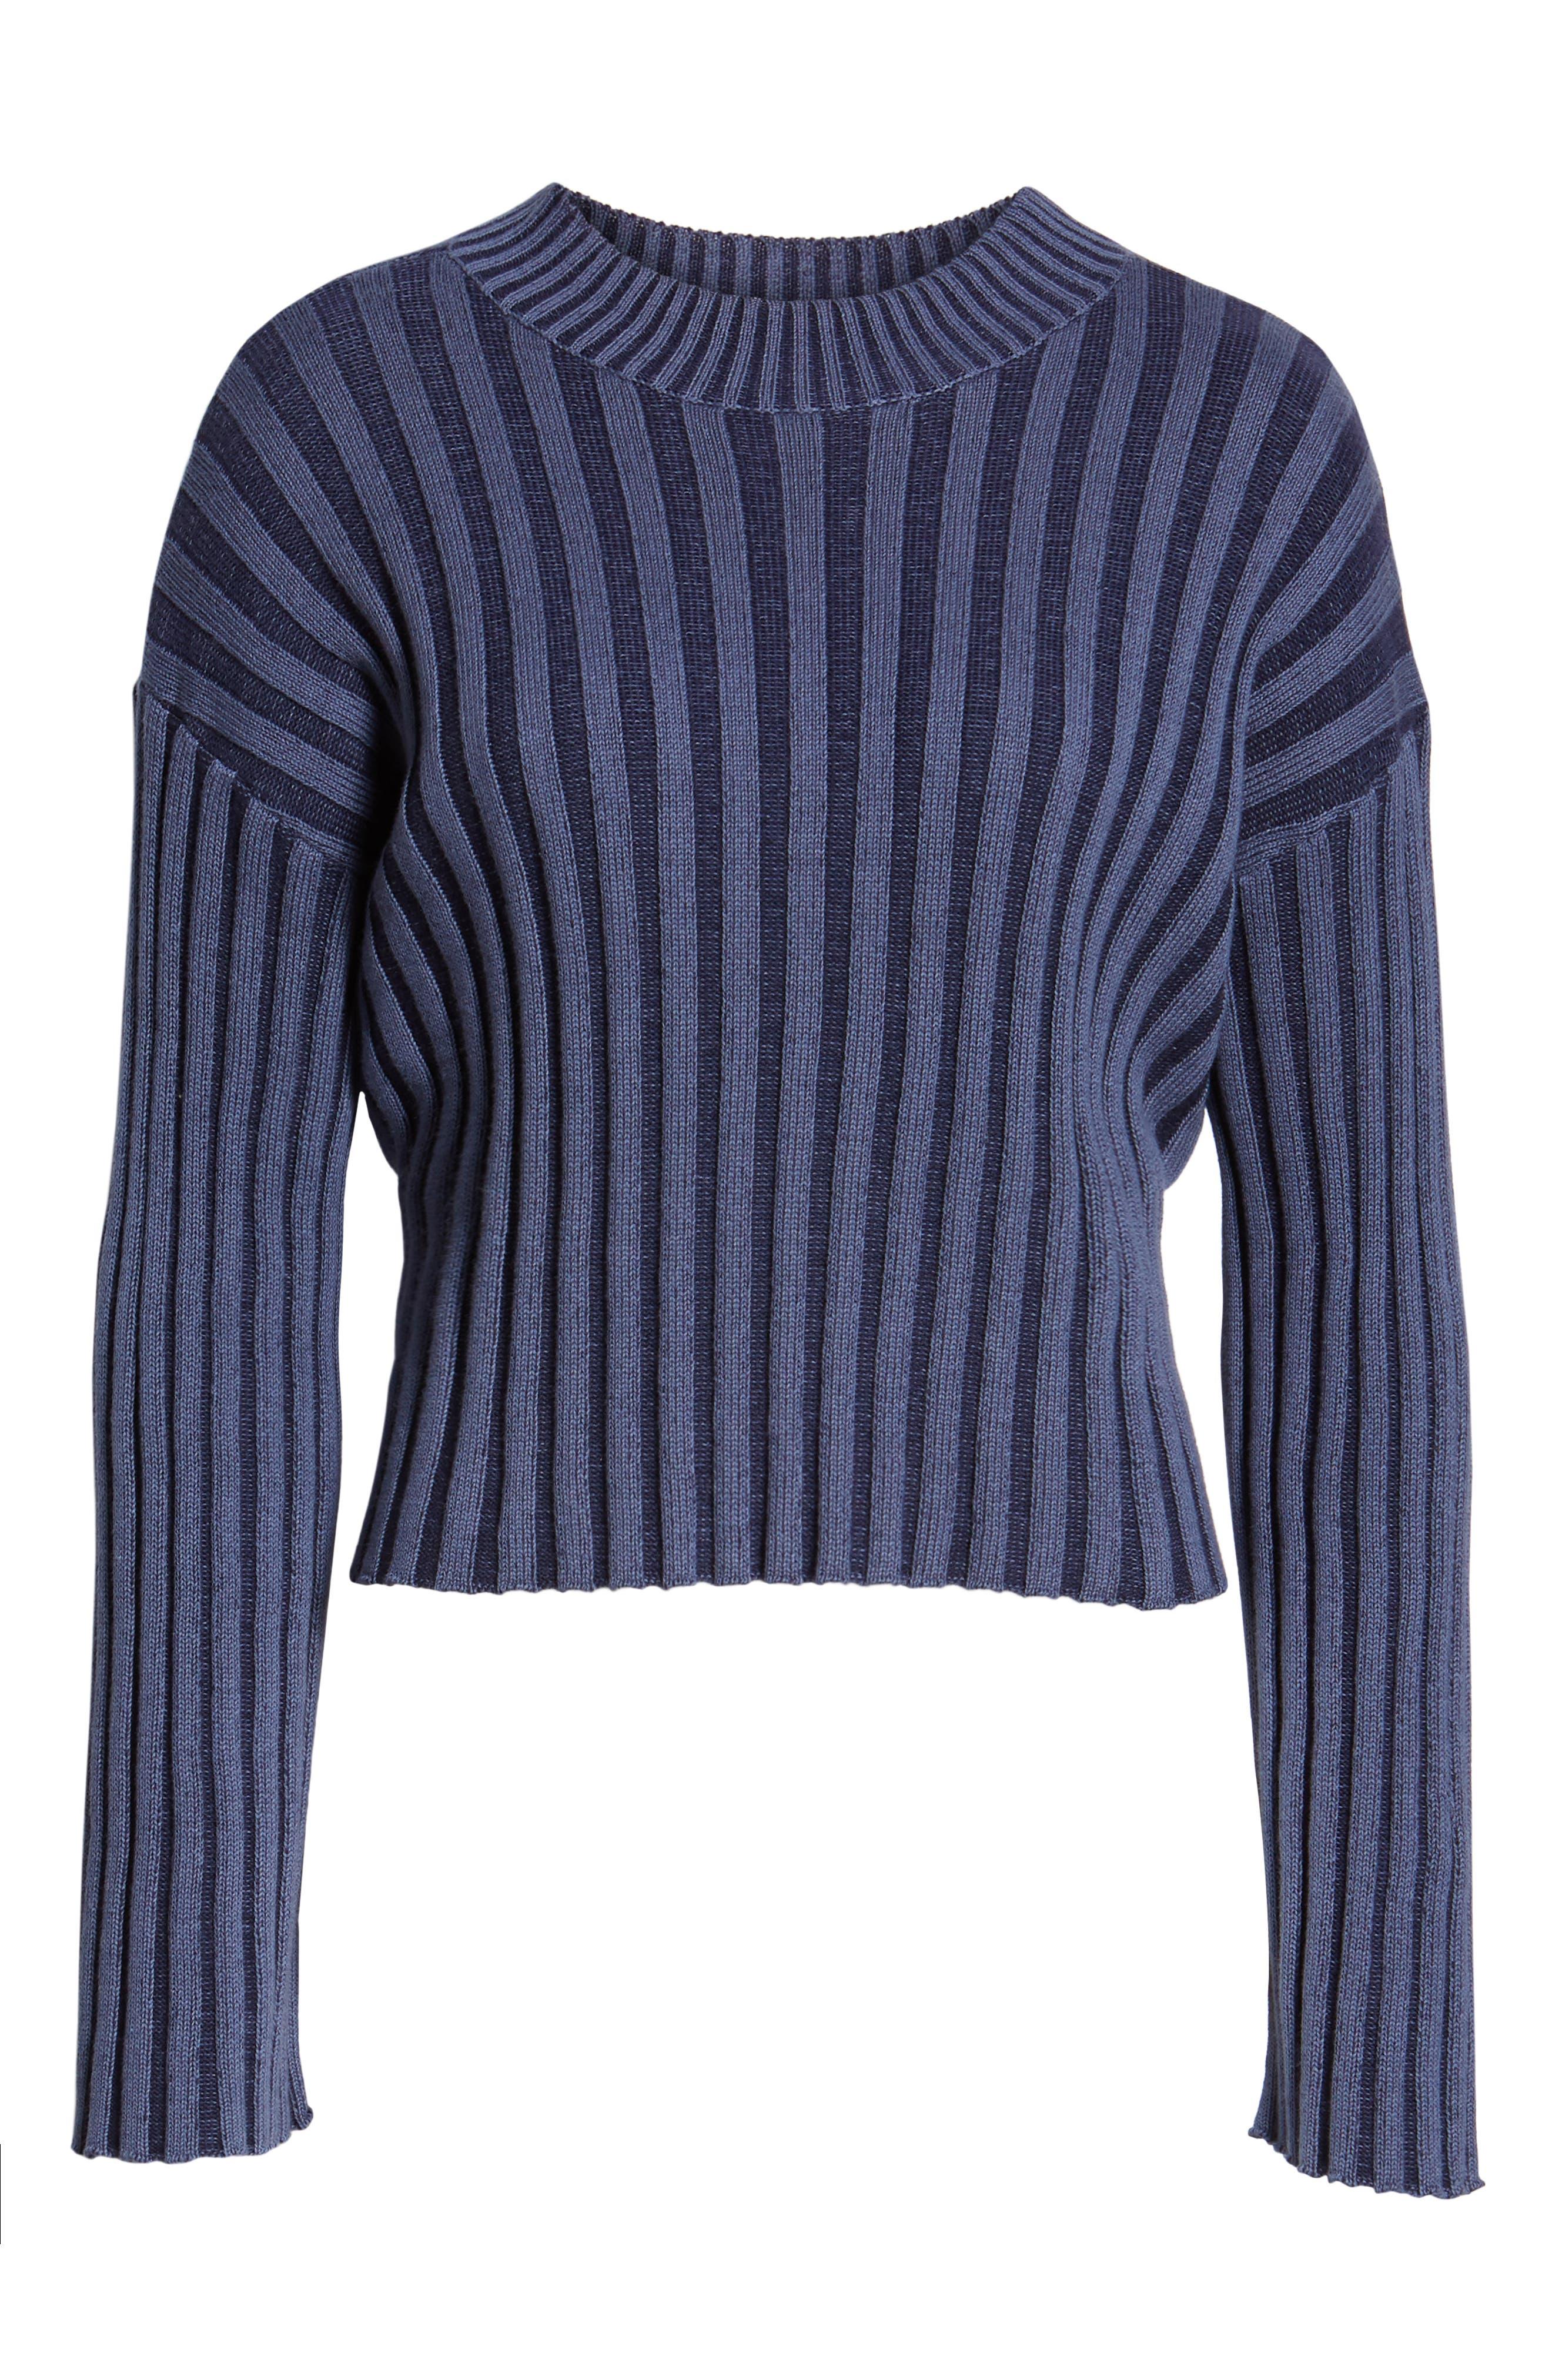 Shadow Rib Crop Sweater,                             Alternate thumbnail 7, color,                             NAVY EVENING